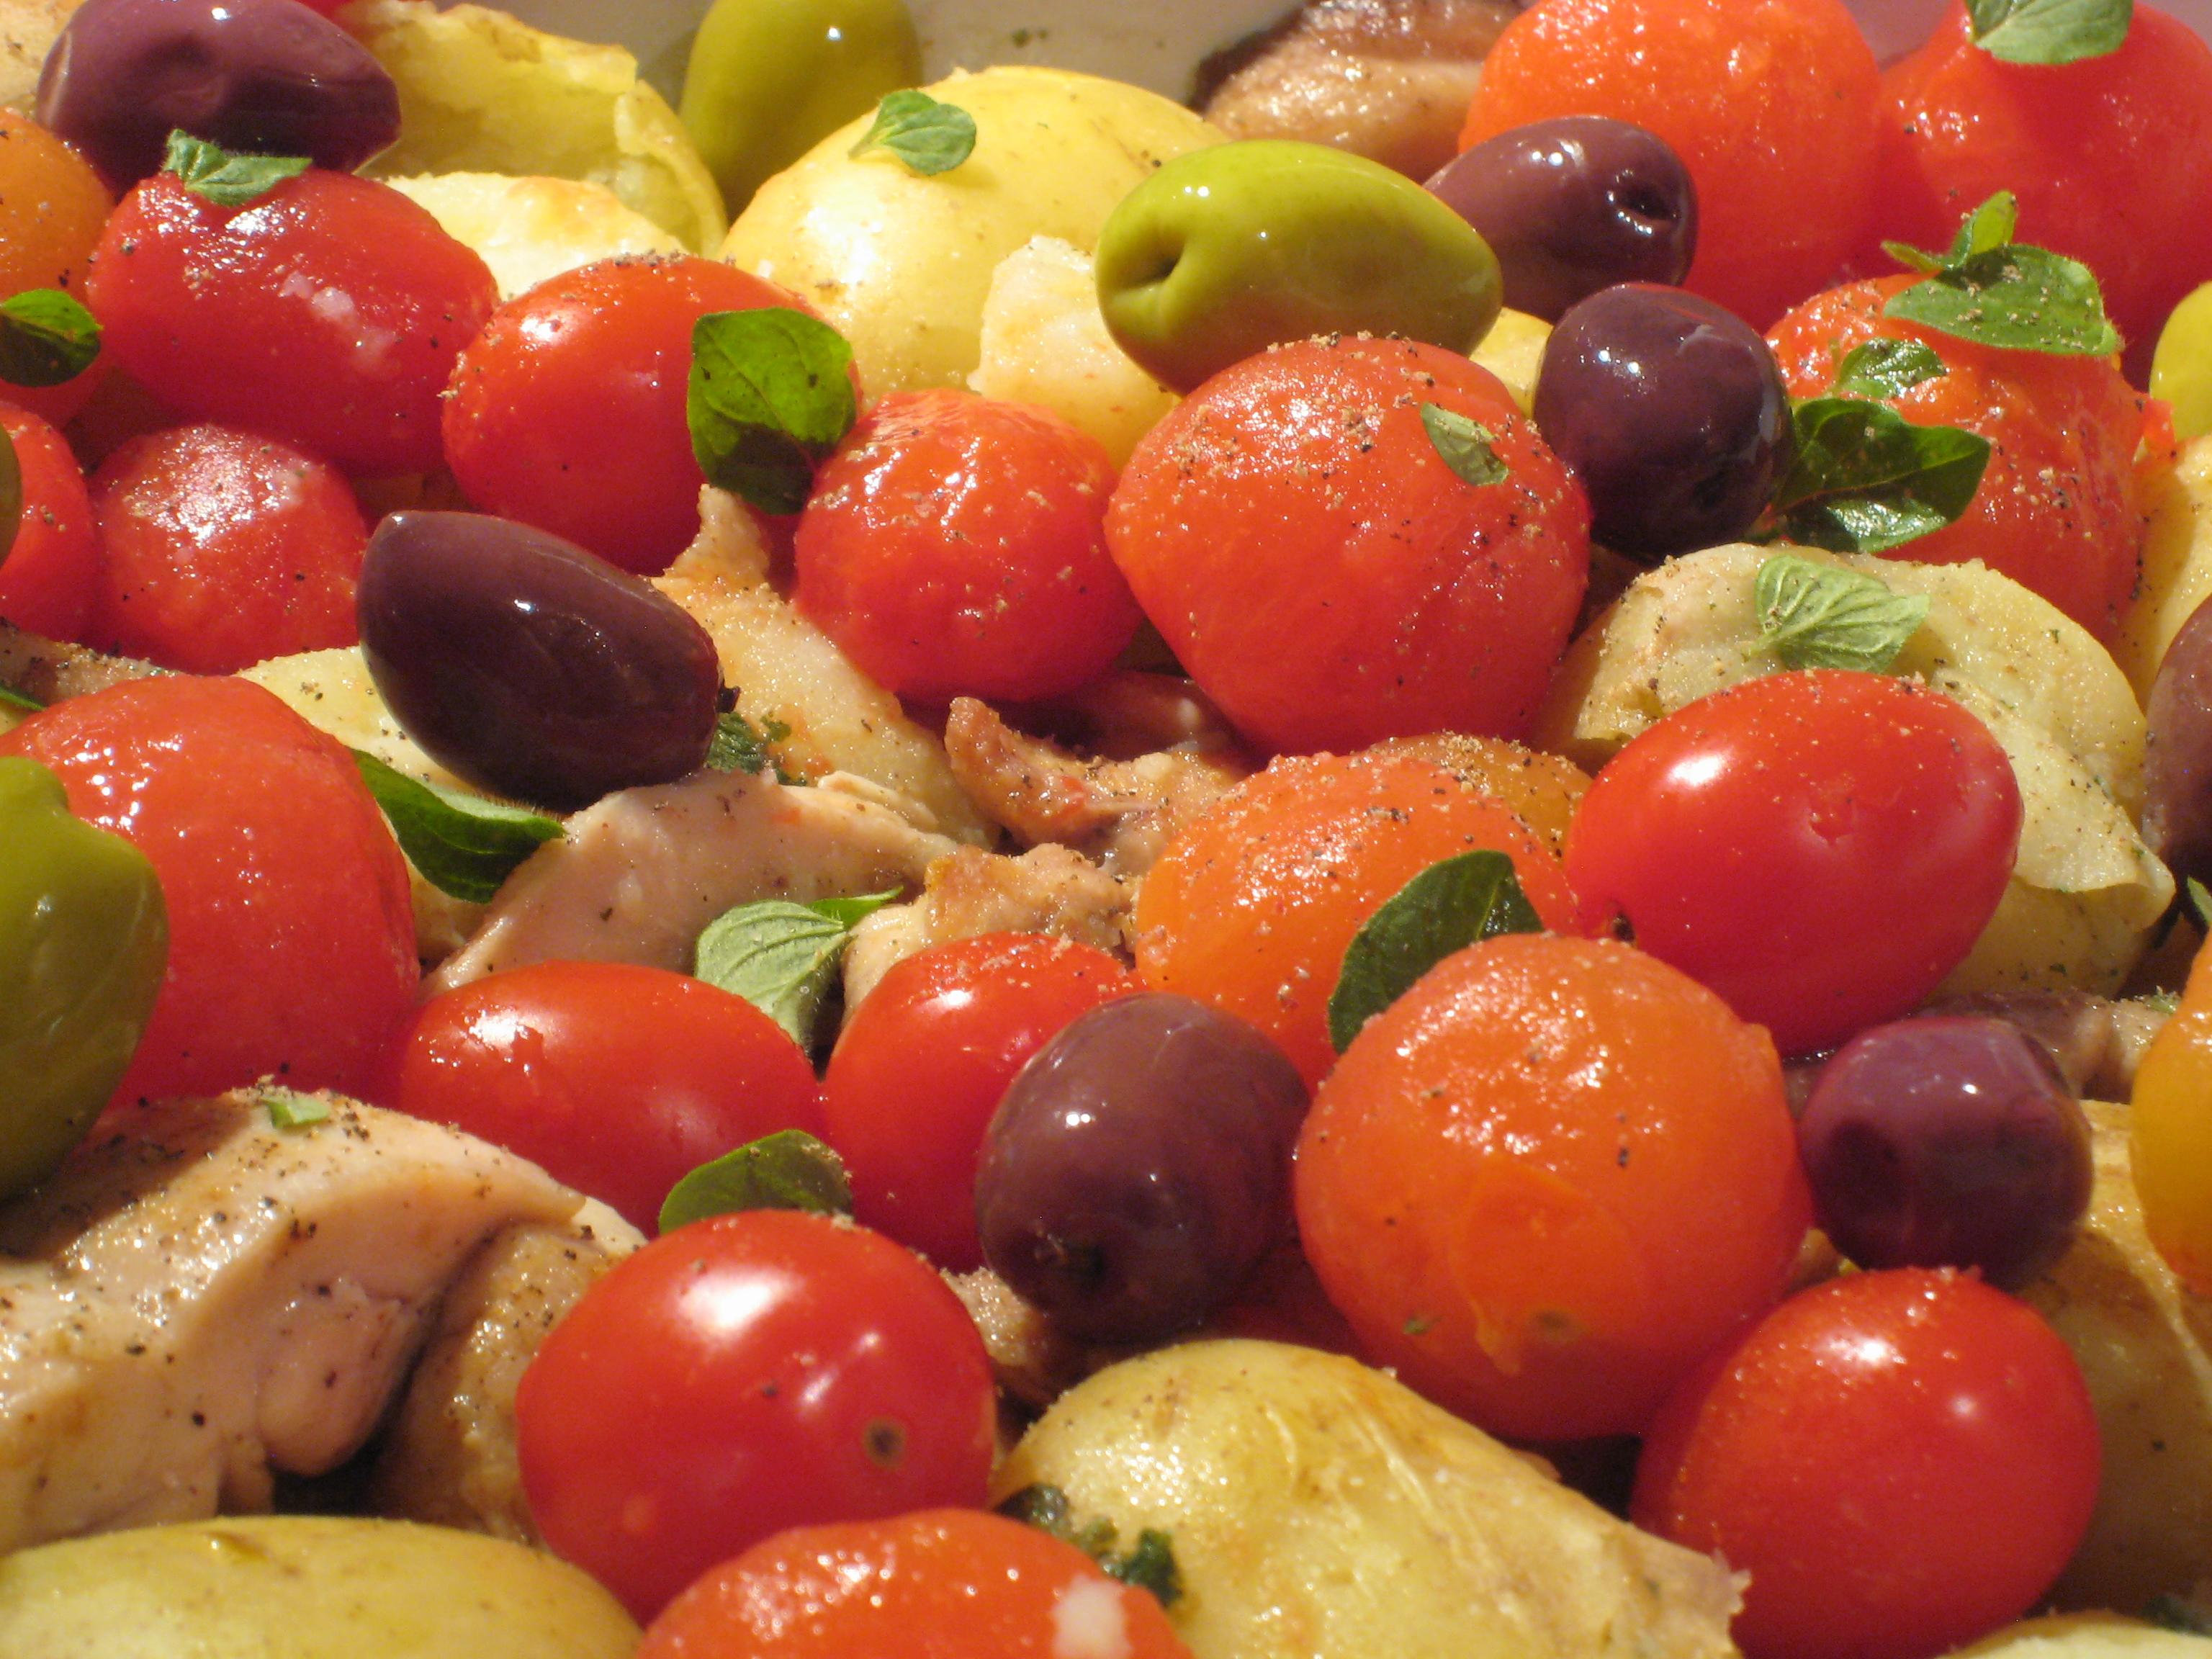 tomato and potato relationship trust